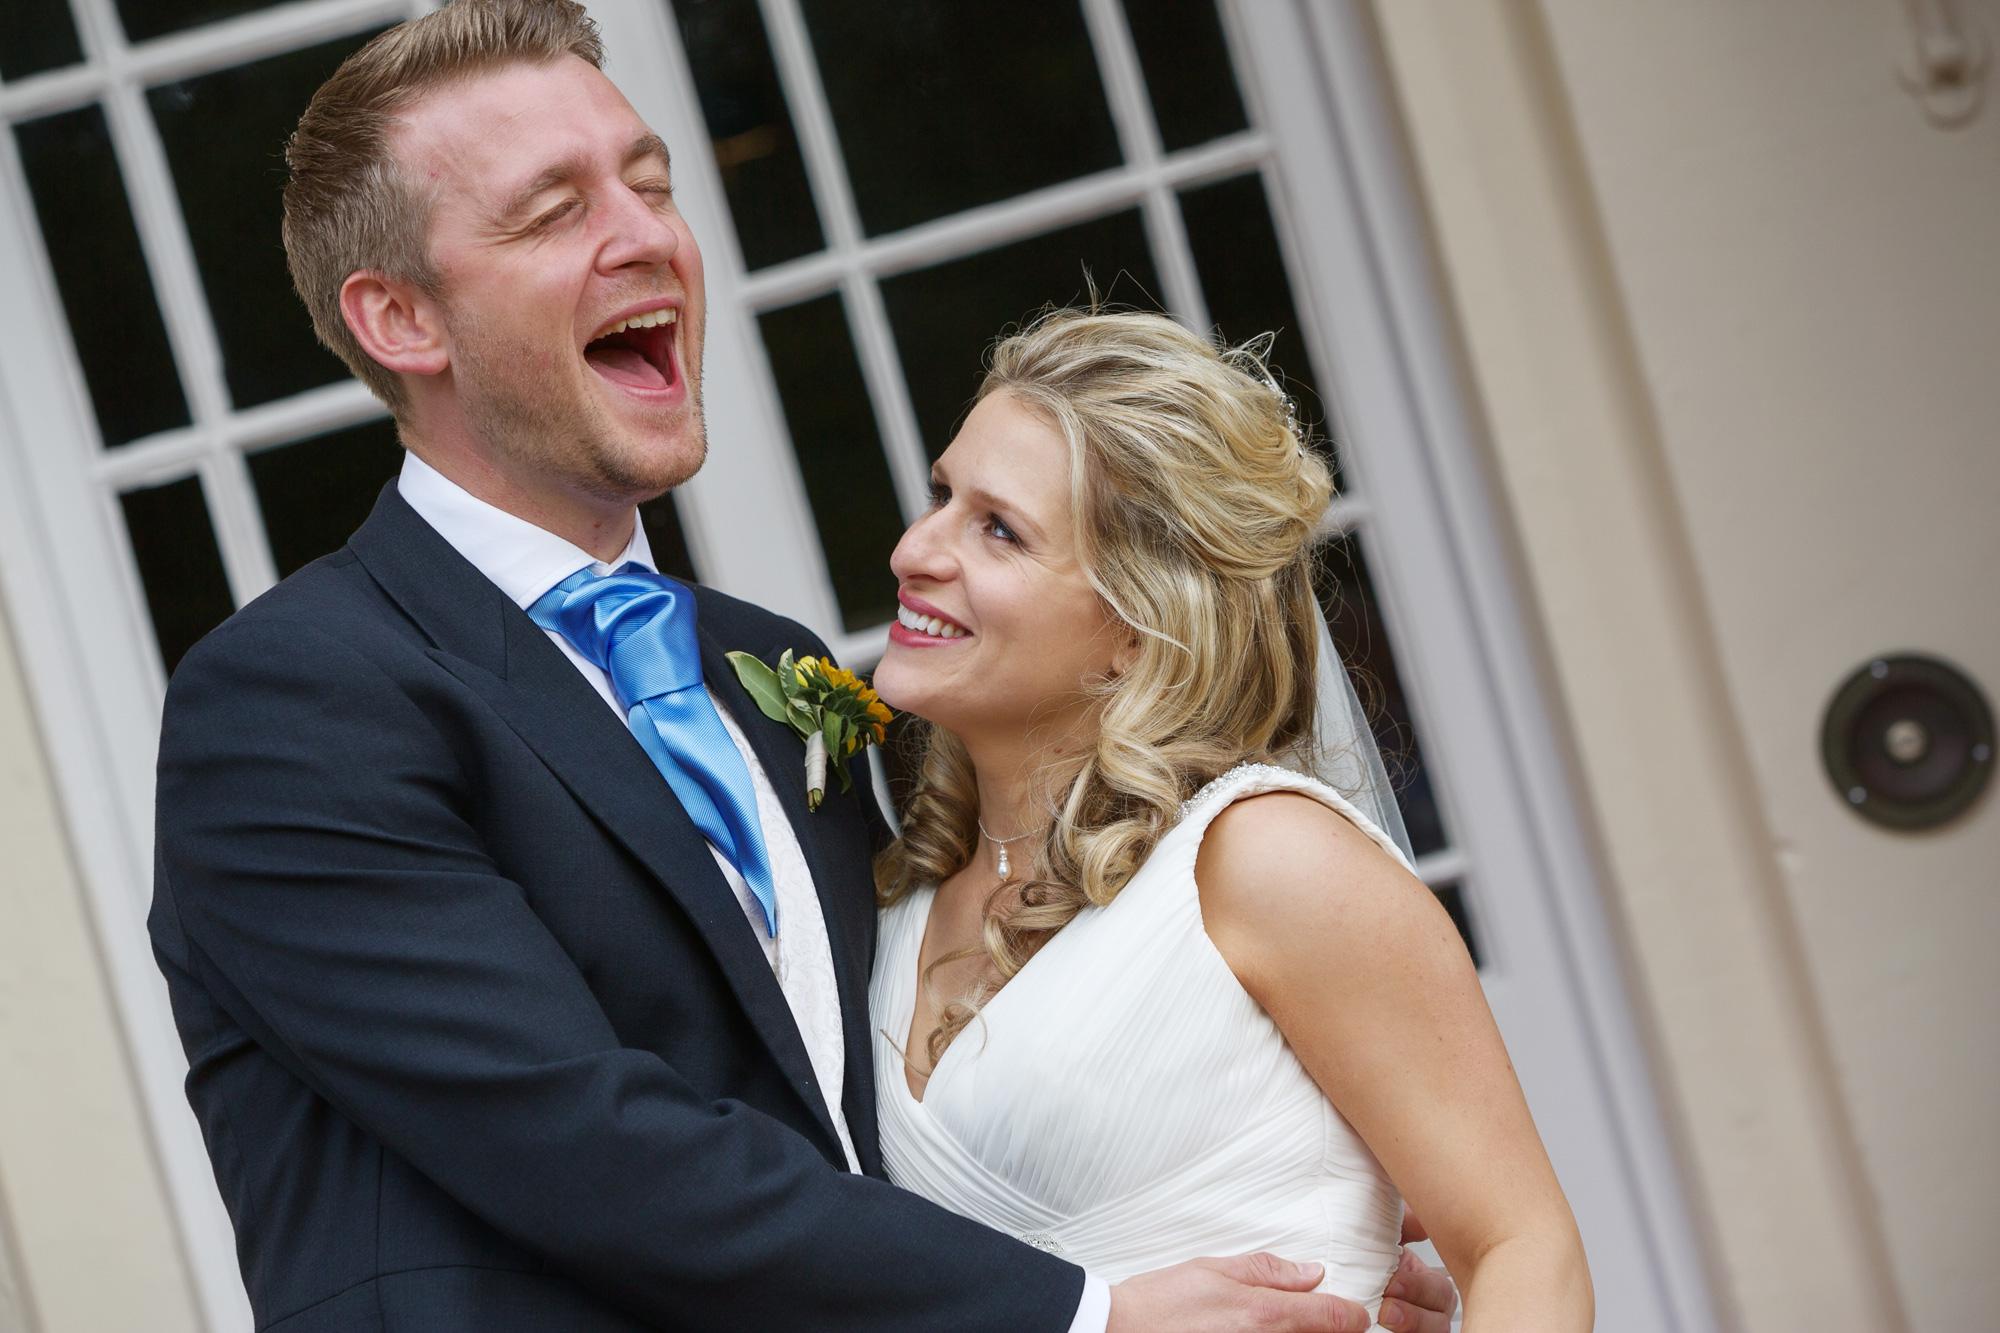 Adam_Hillier_Wedding_Photographer_Newbury_Berkshire_6 (5).jpg